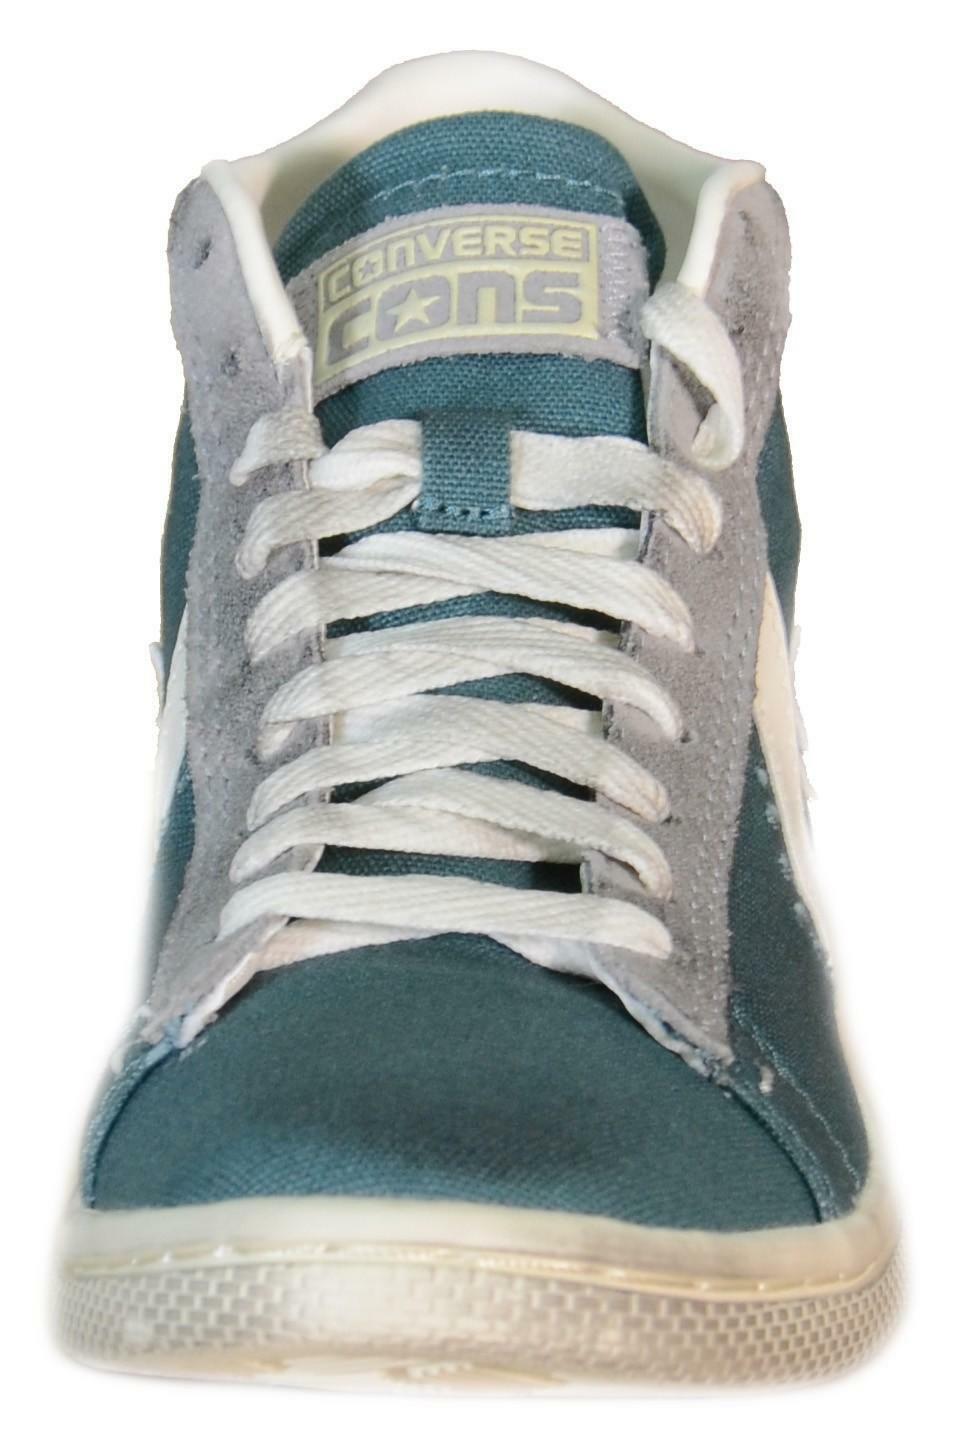 converse converse pro lthr lp mid amarna green scarpe verdi tela 143898